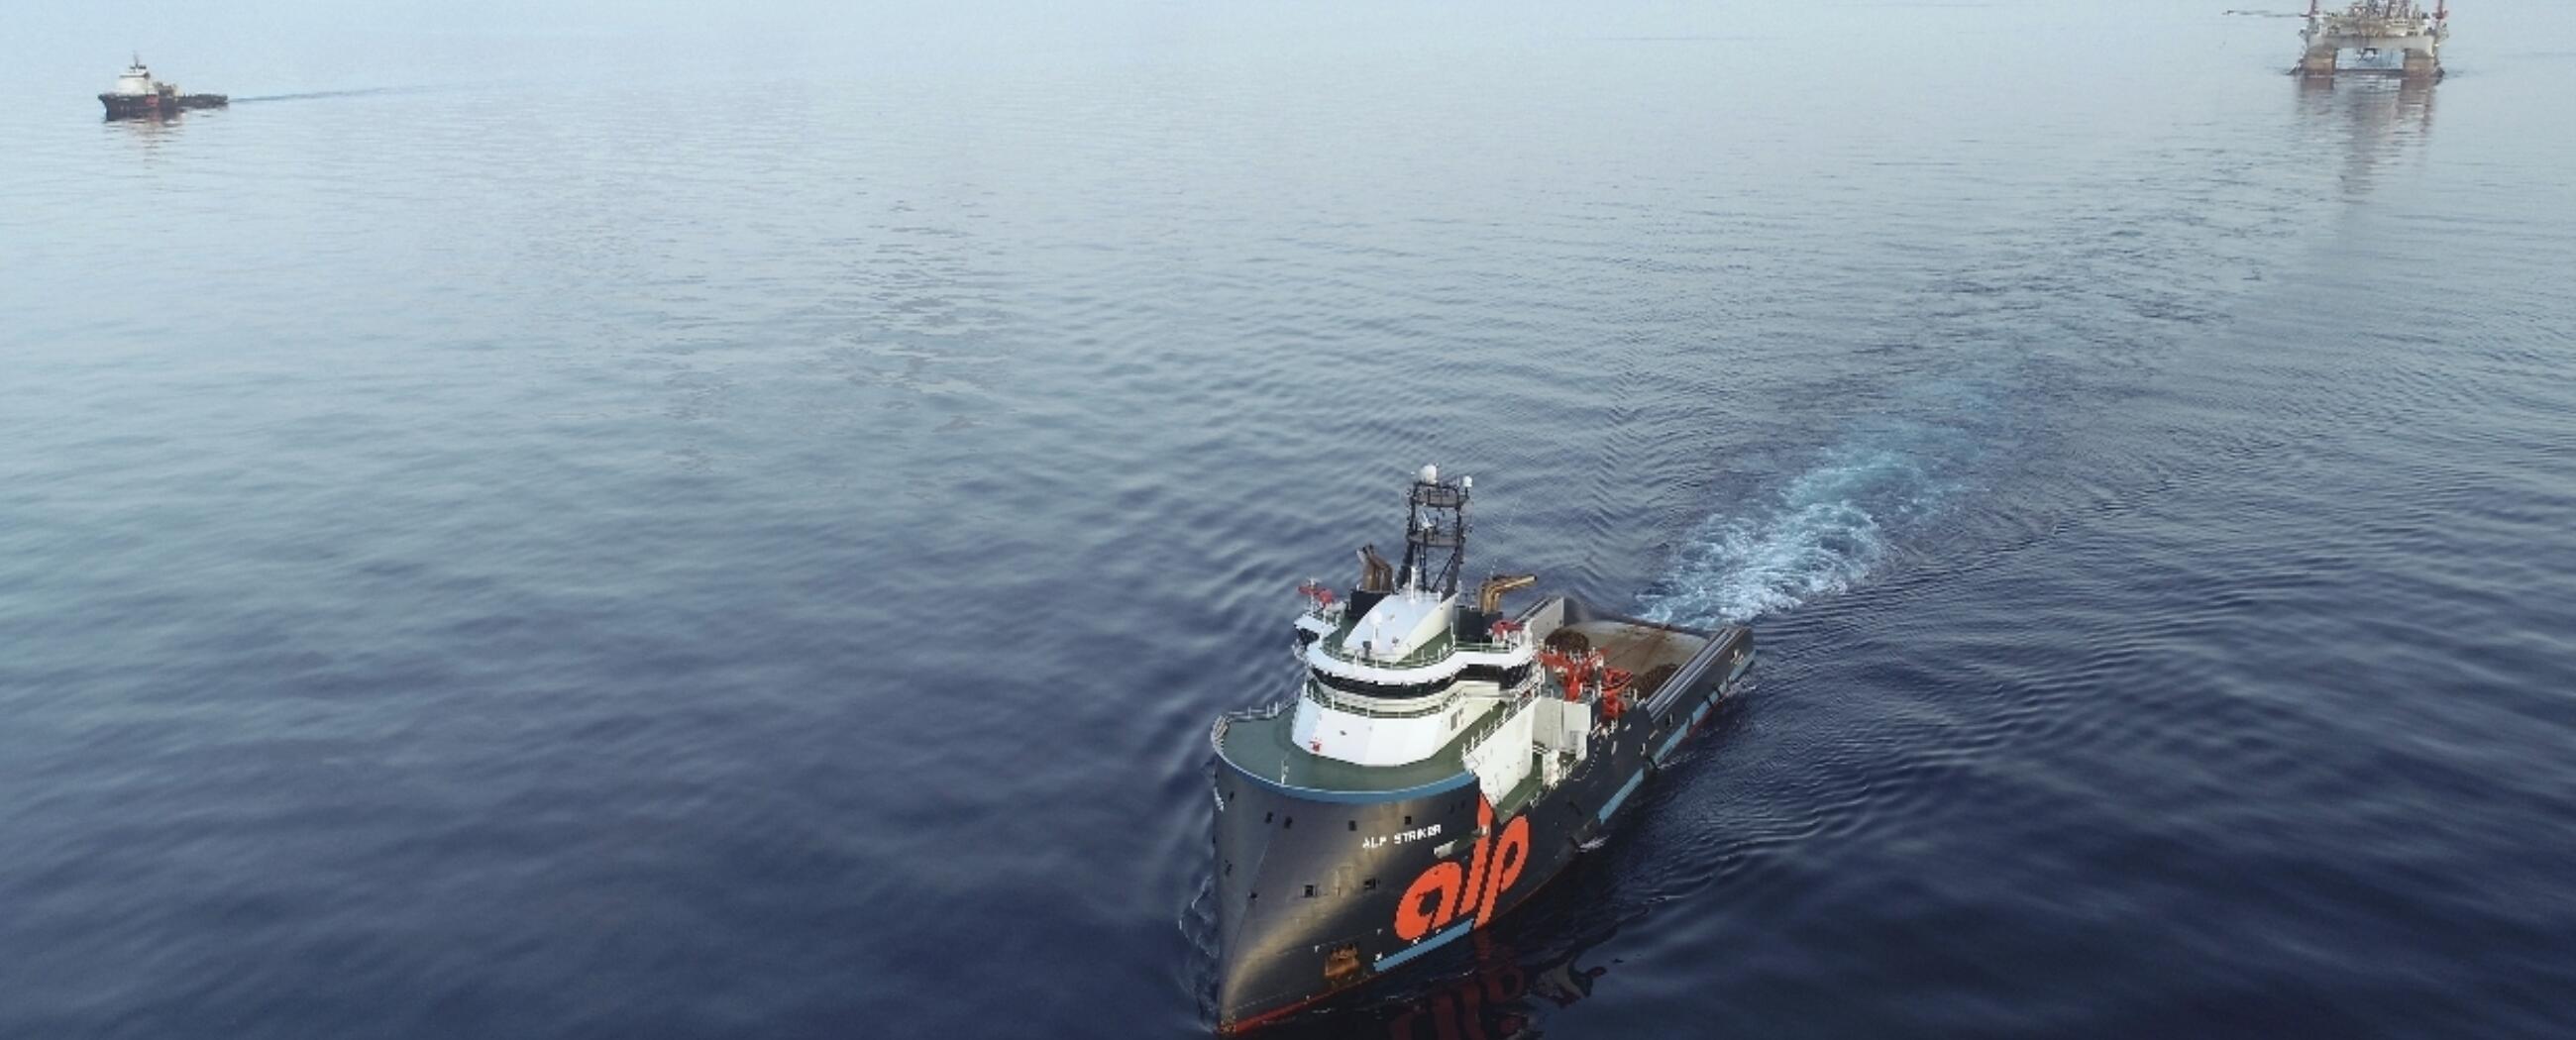 ALP-Striker-towing-West-Capricorn.JPG